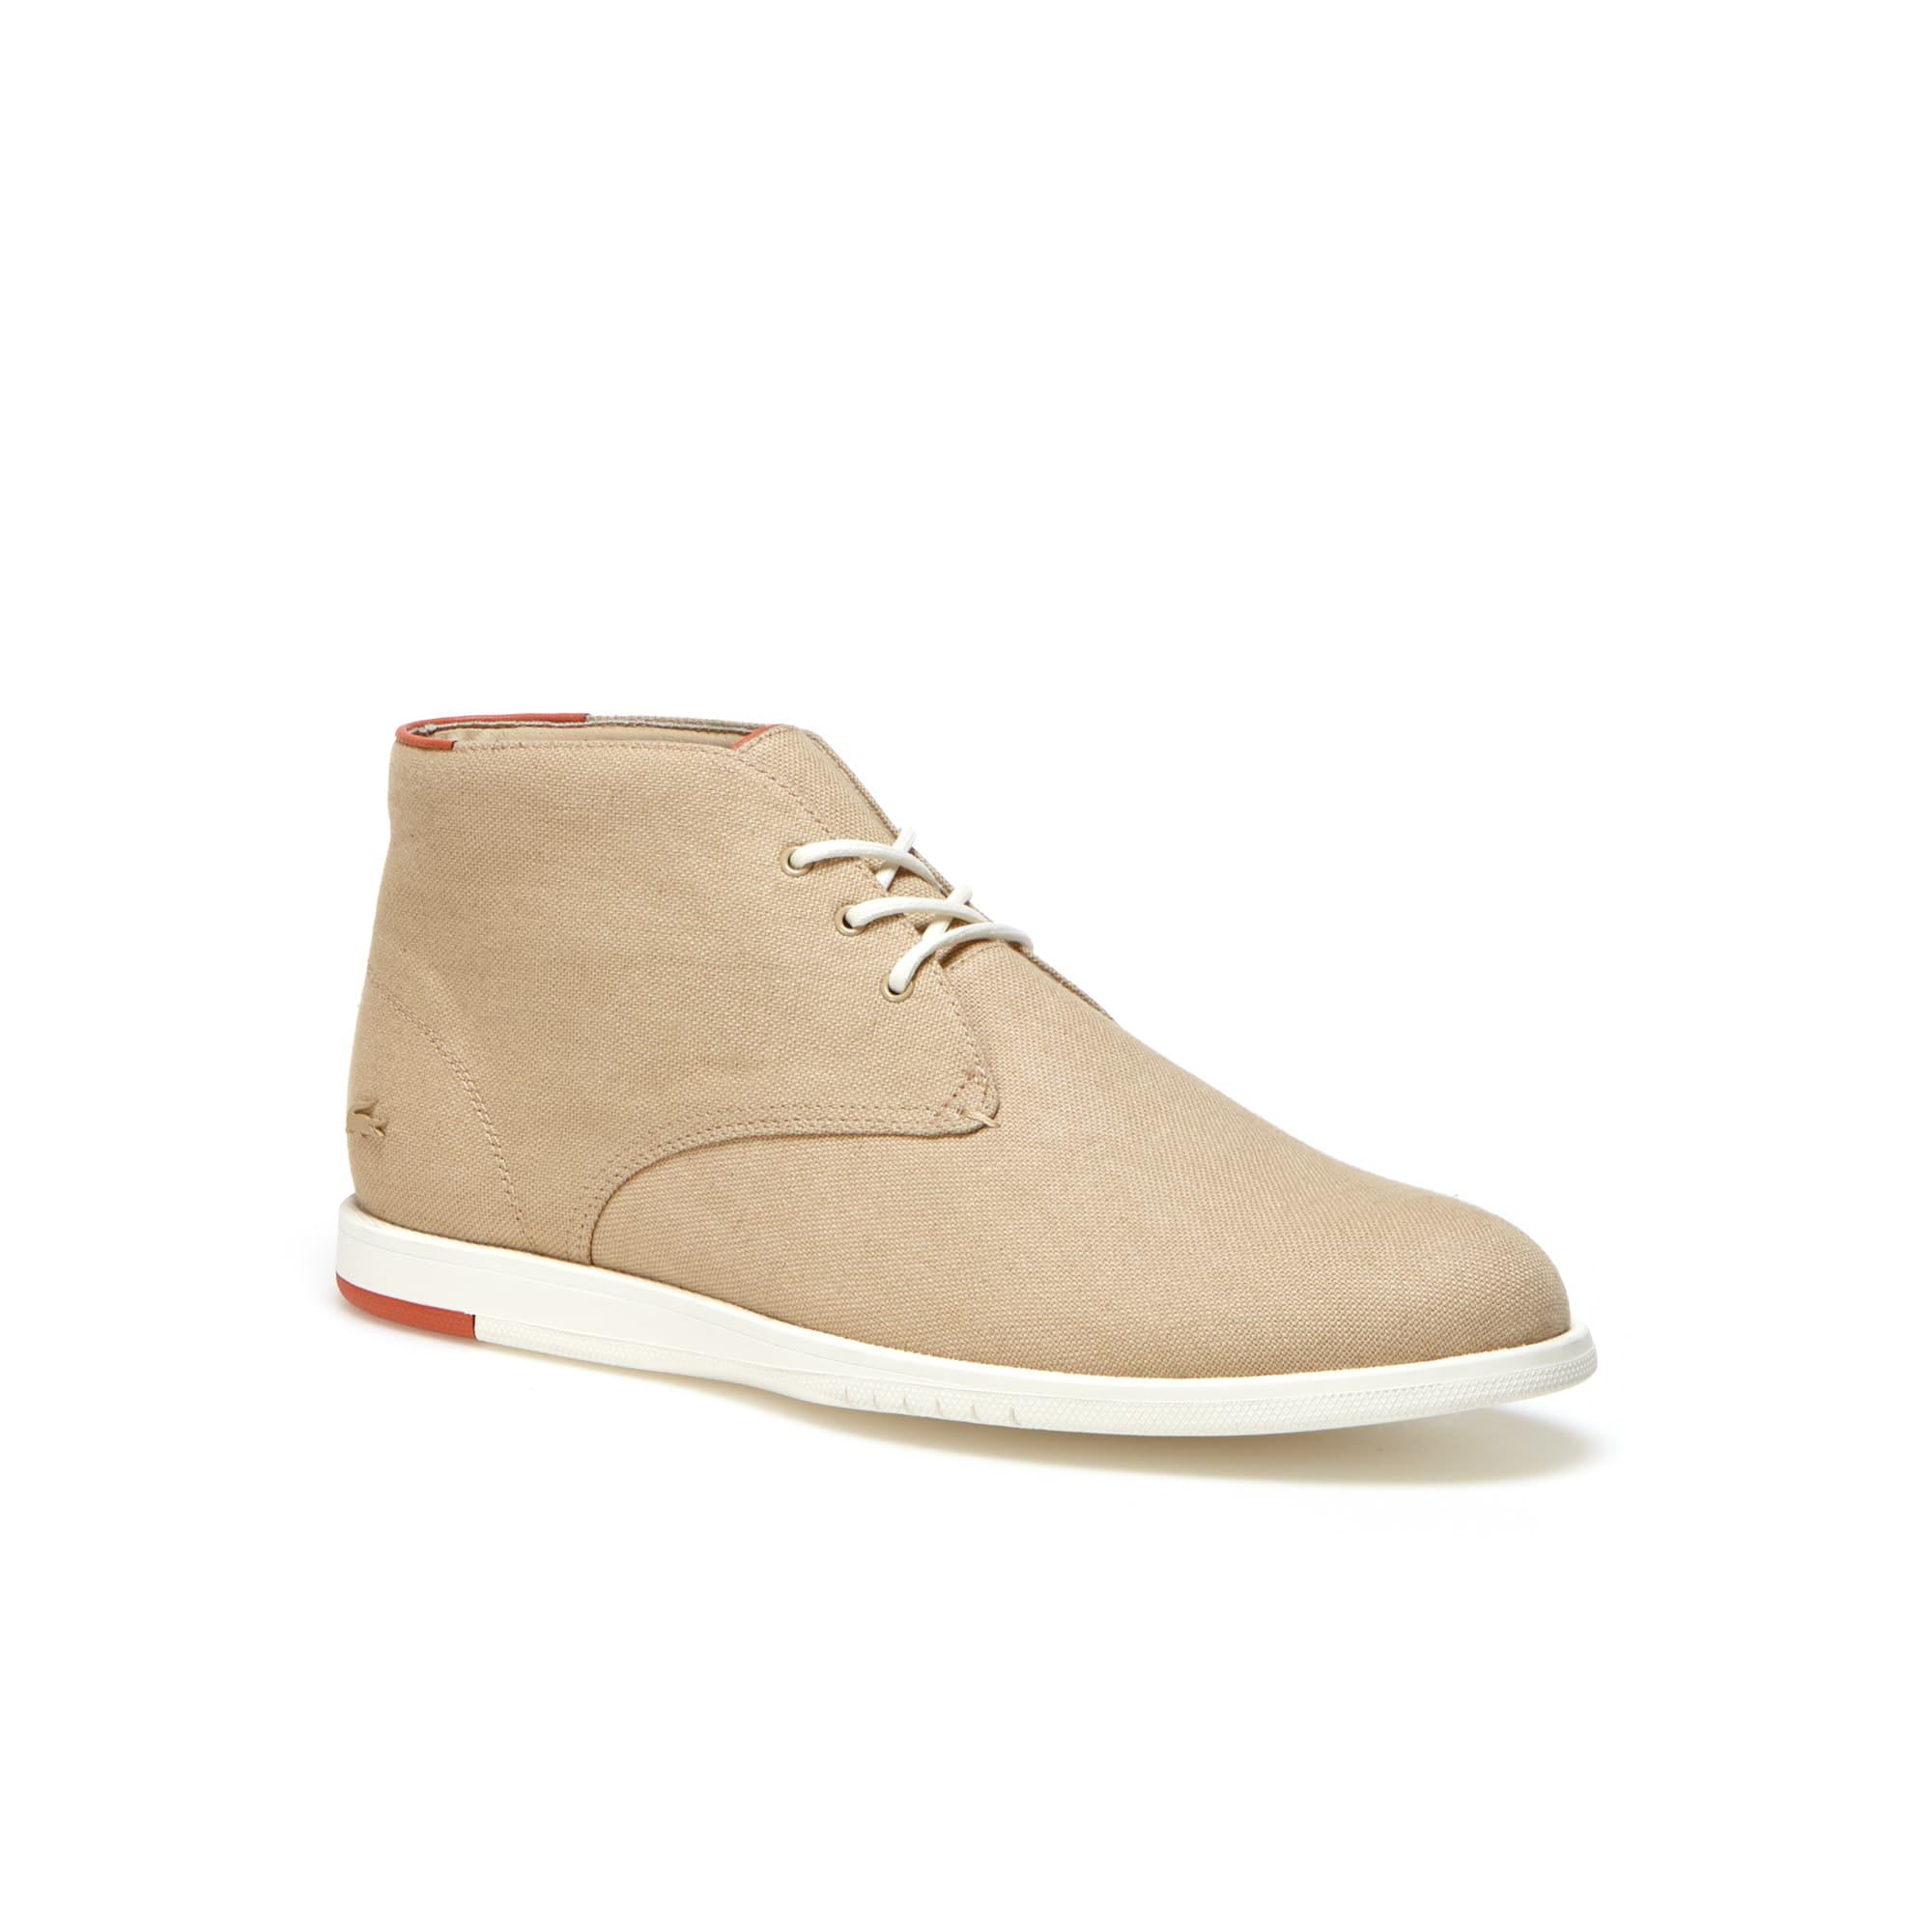 Men's Laccord Canvas Shoes